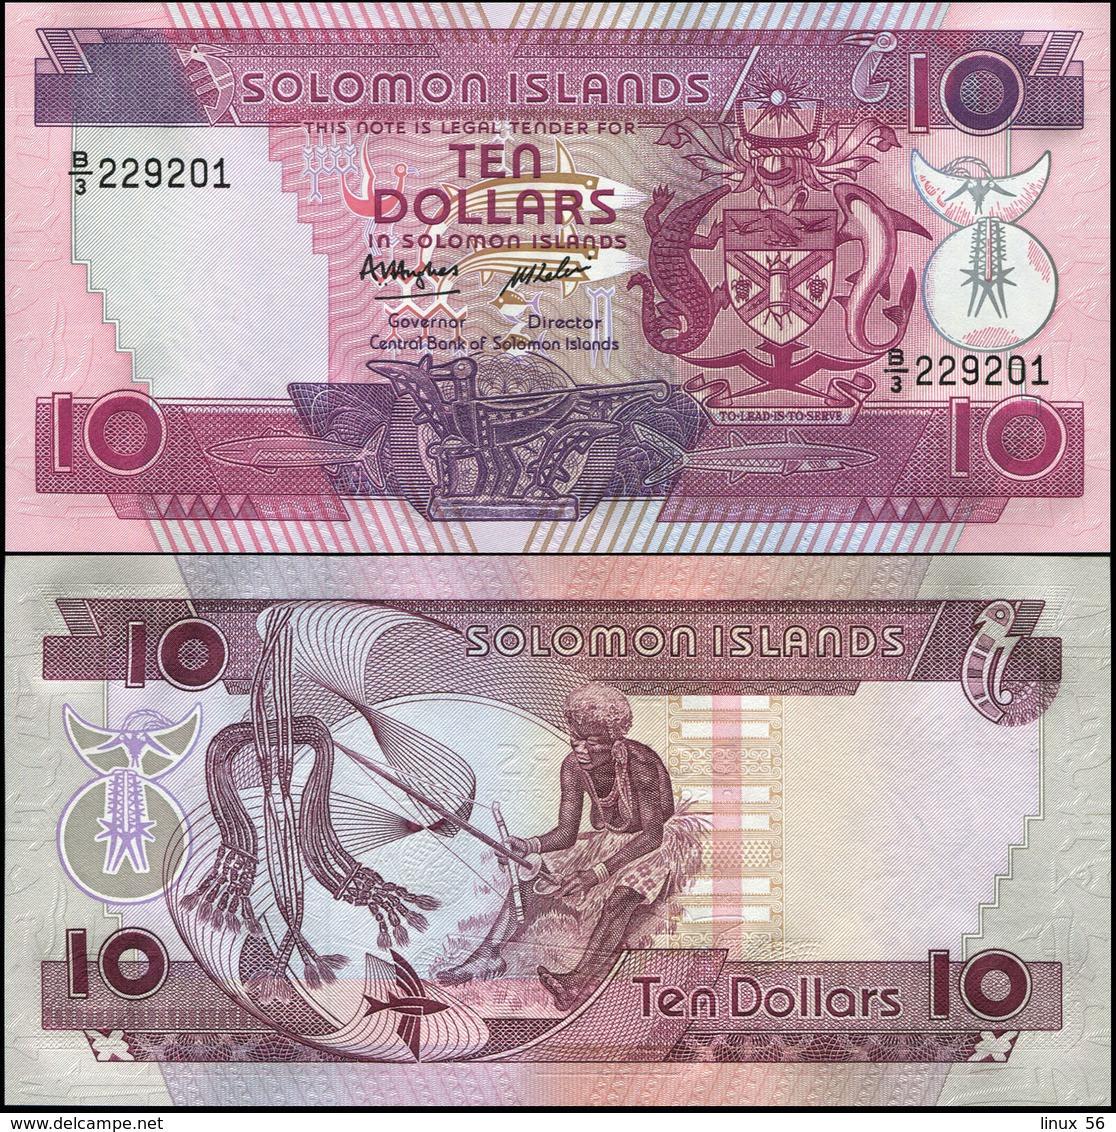 SOLOMON ISLANDS - 10 Dollars Nd.(1986) UNC P.15 - Isola Salomon